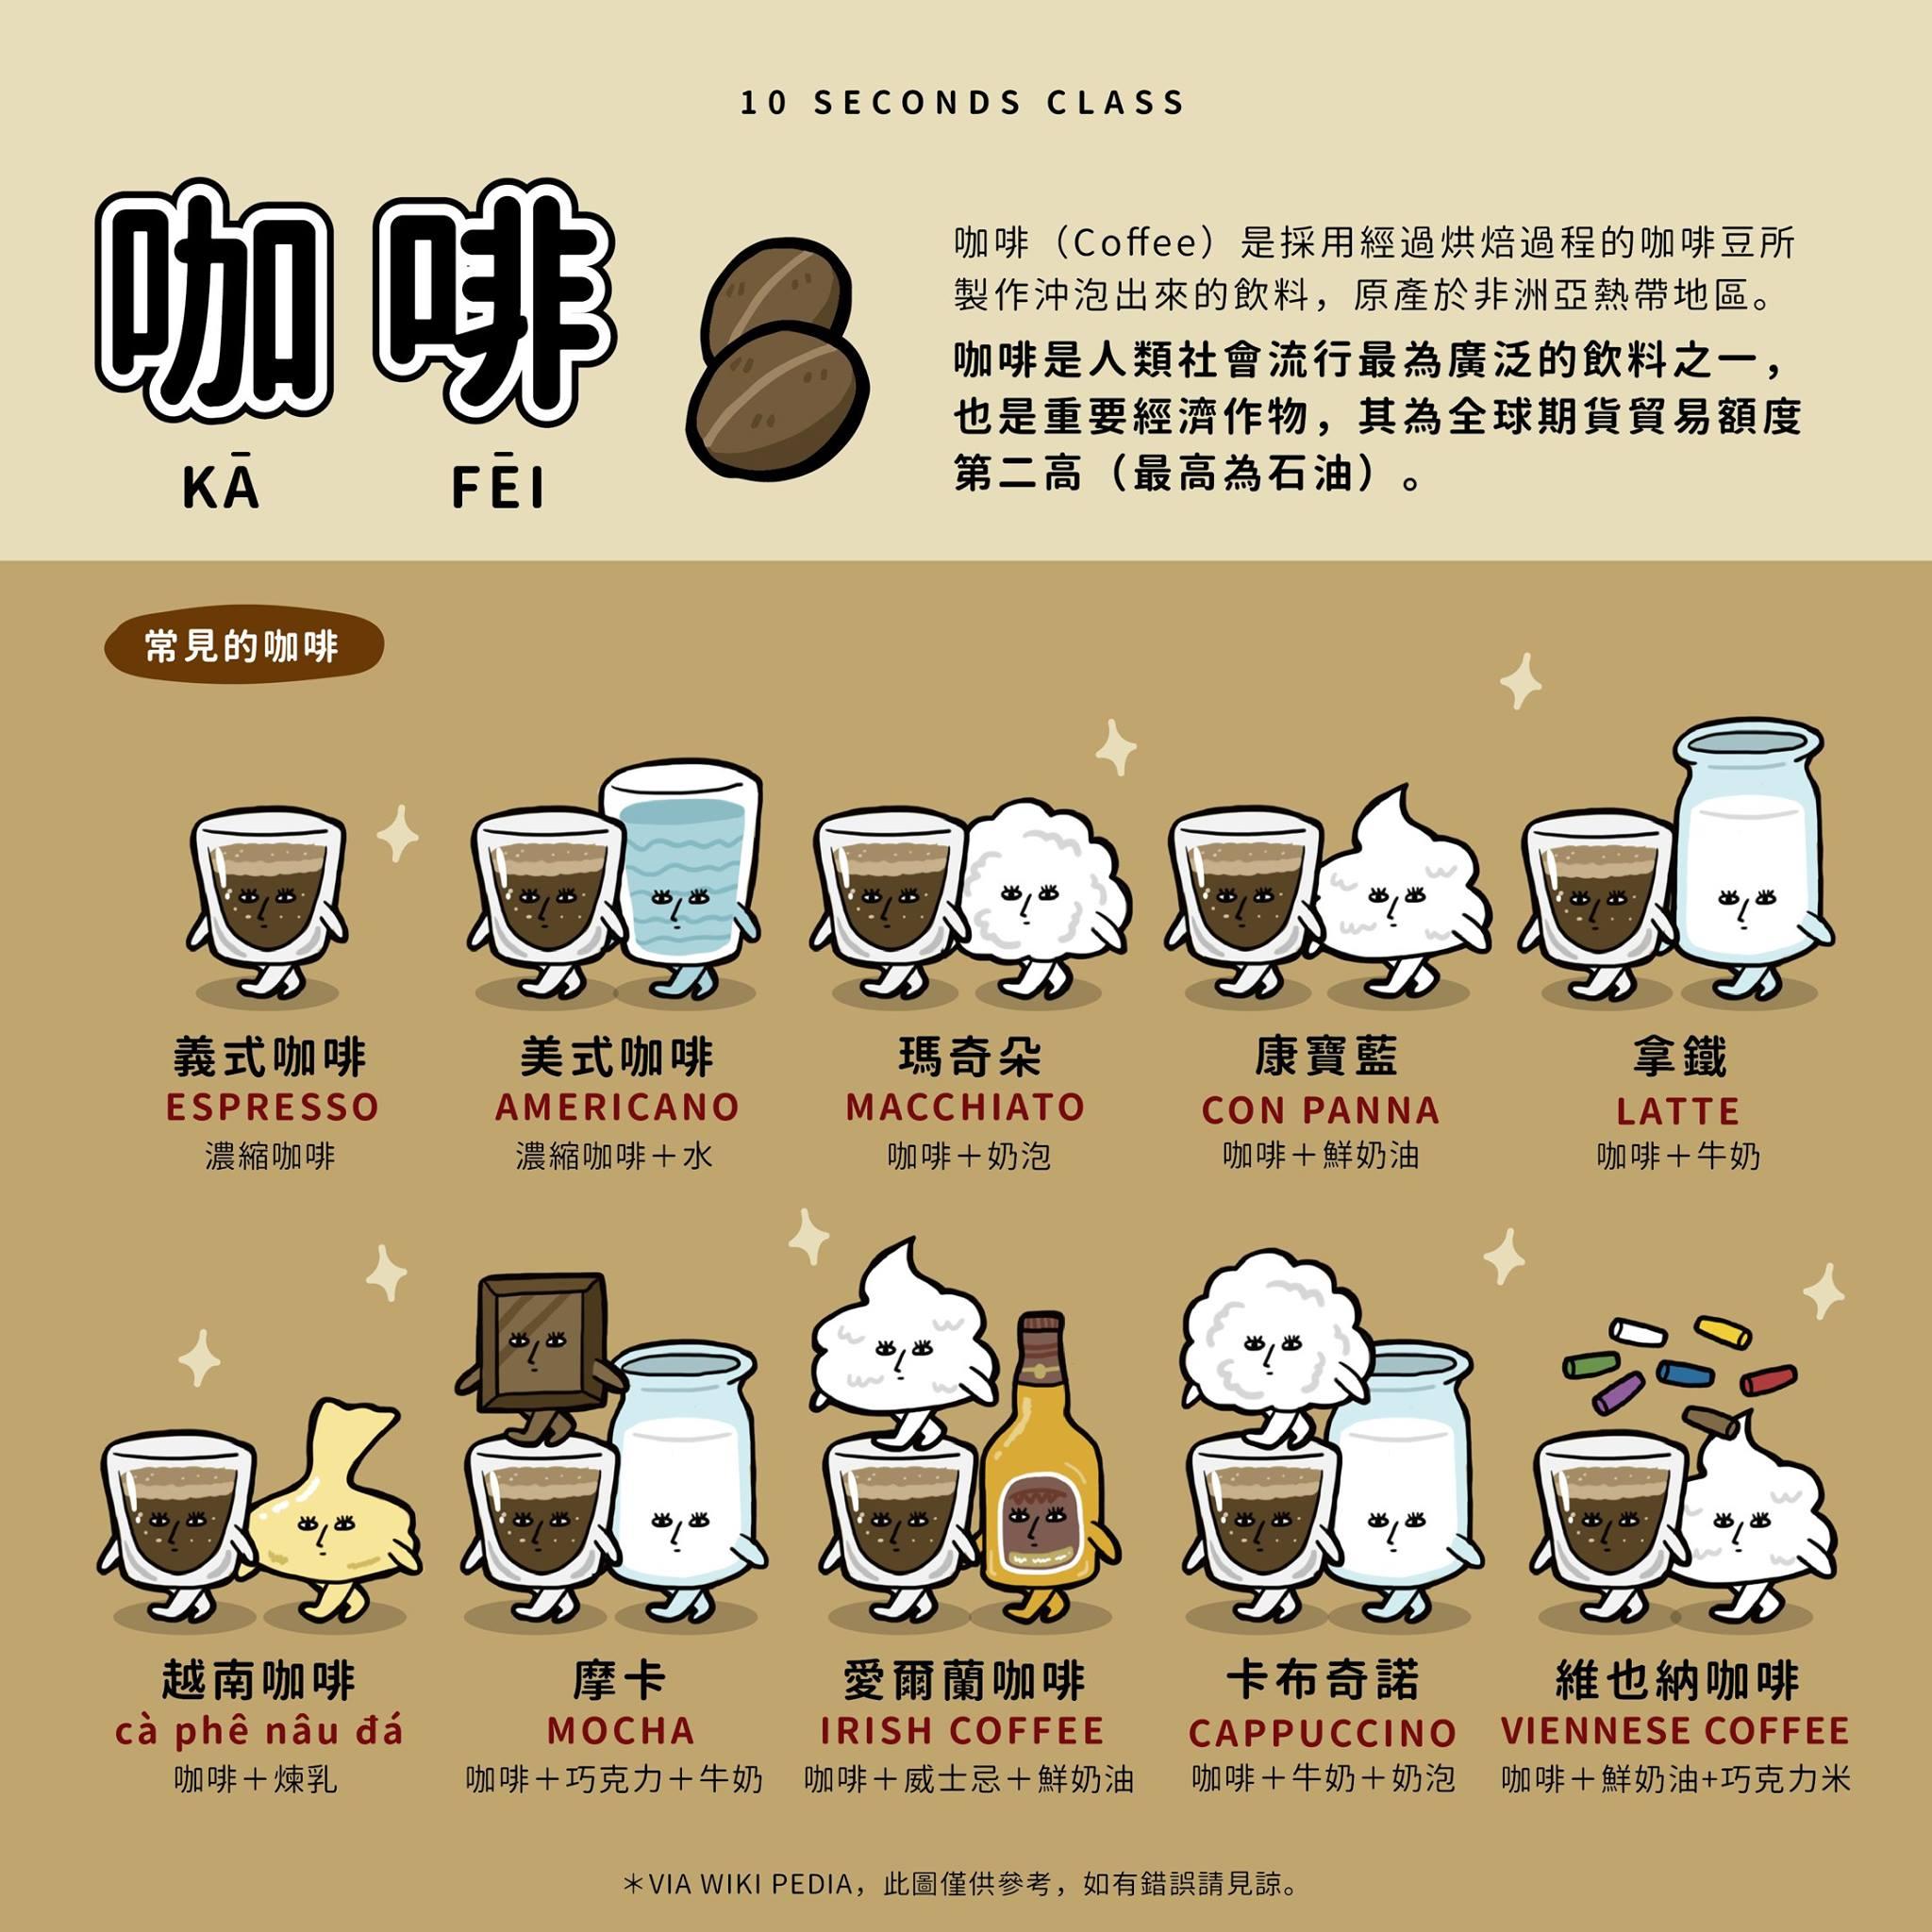 [圖解] 咖啡名稱與成分 (Coffee Name and Composition) | 逍遙文工作室